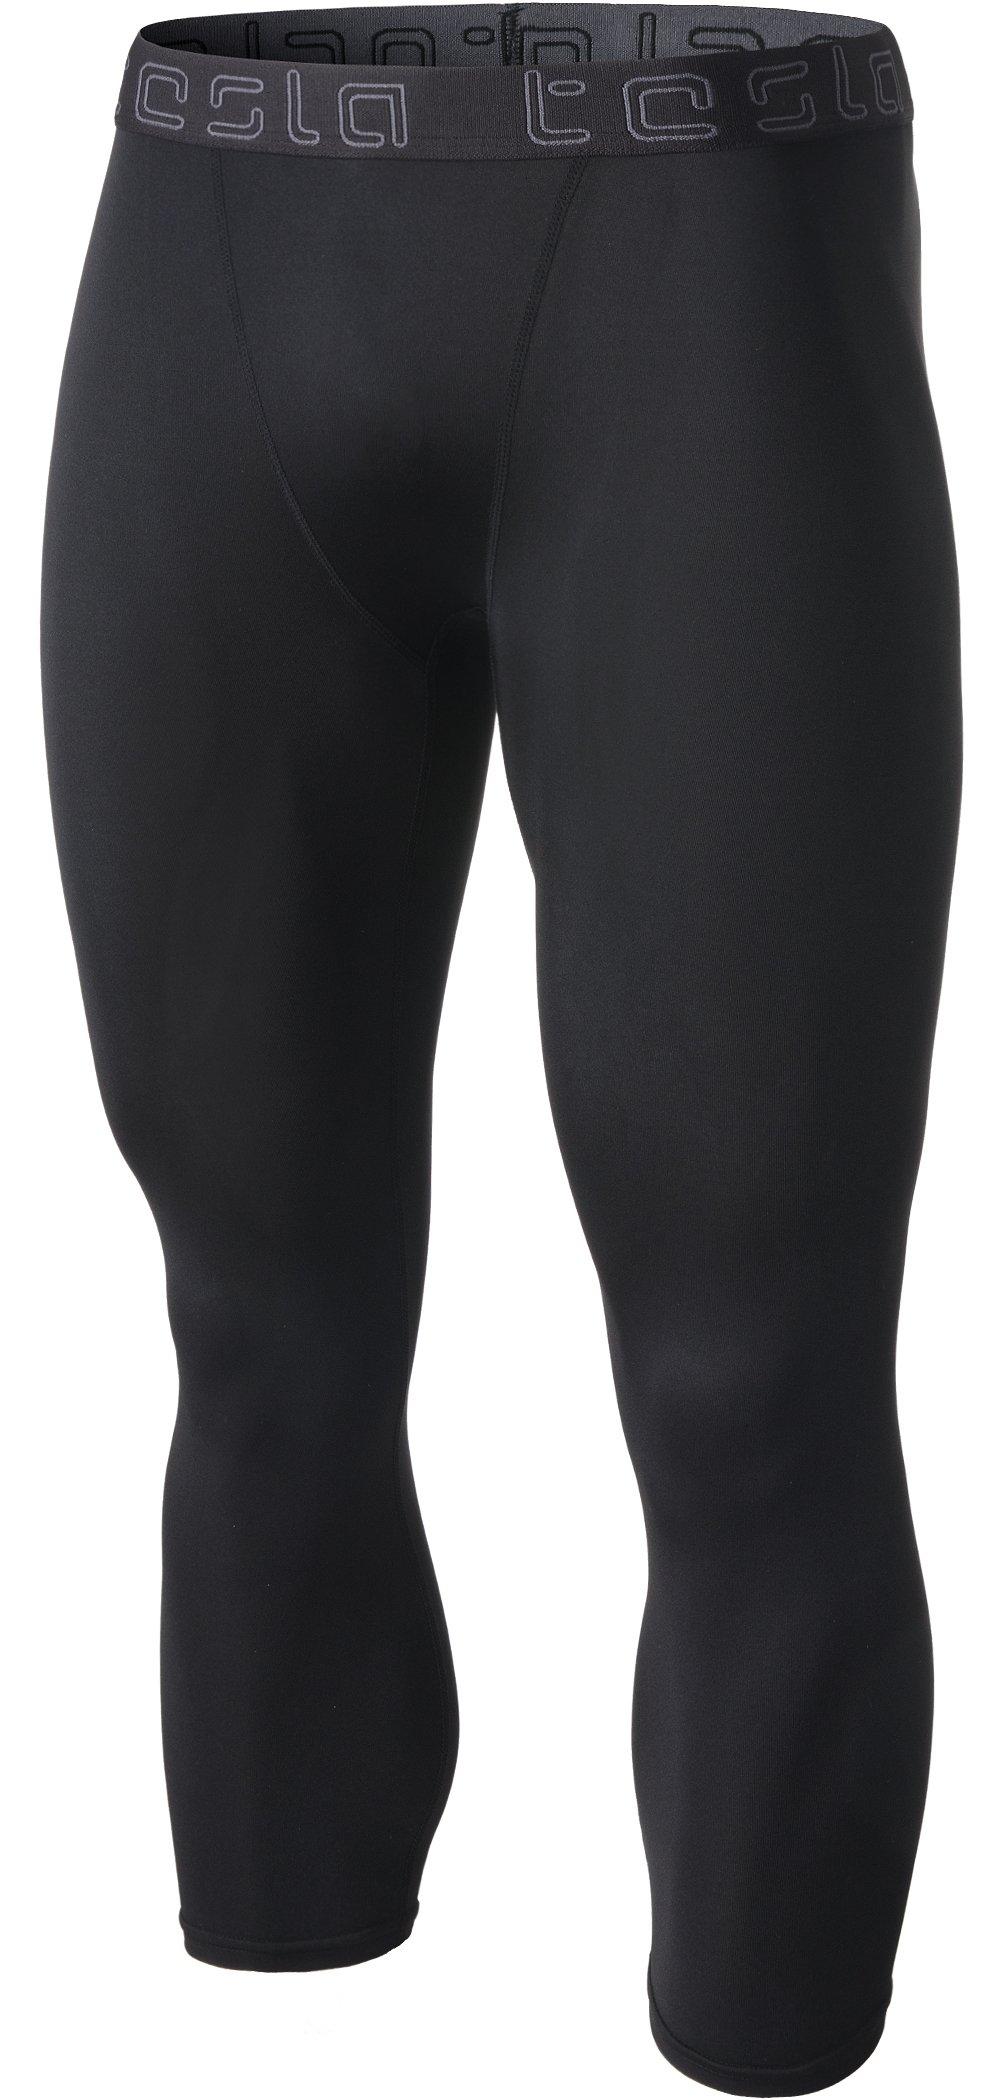 TSLA Men's Compression 3/4 Capri Pants Baselayer Cool Dry Sports Running Yoga Tights, Basic(muc08) - Black, Large by TSLA